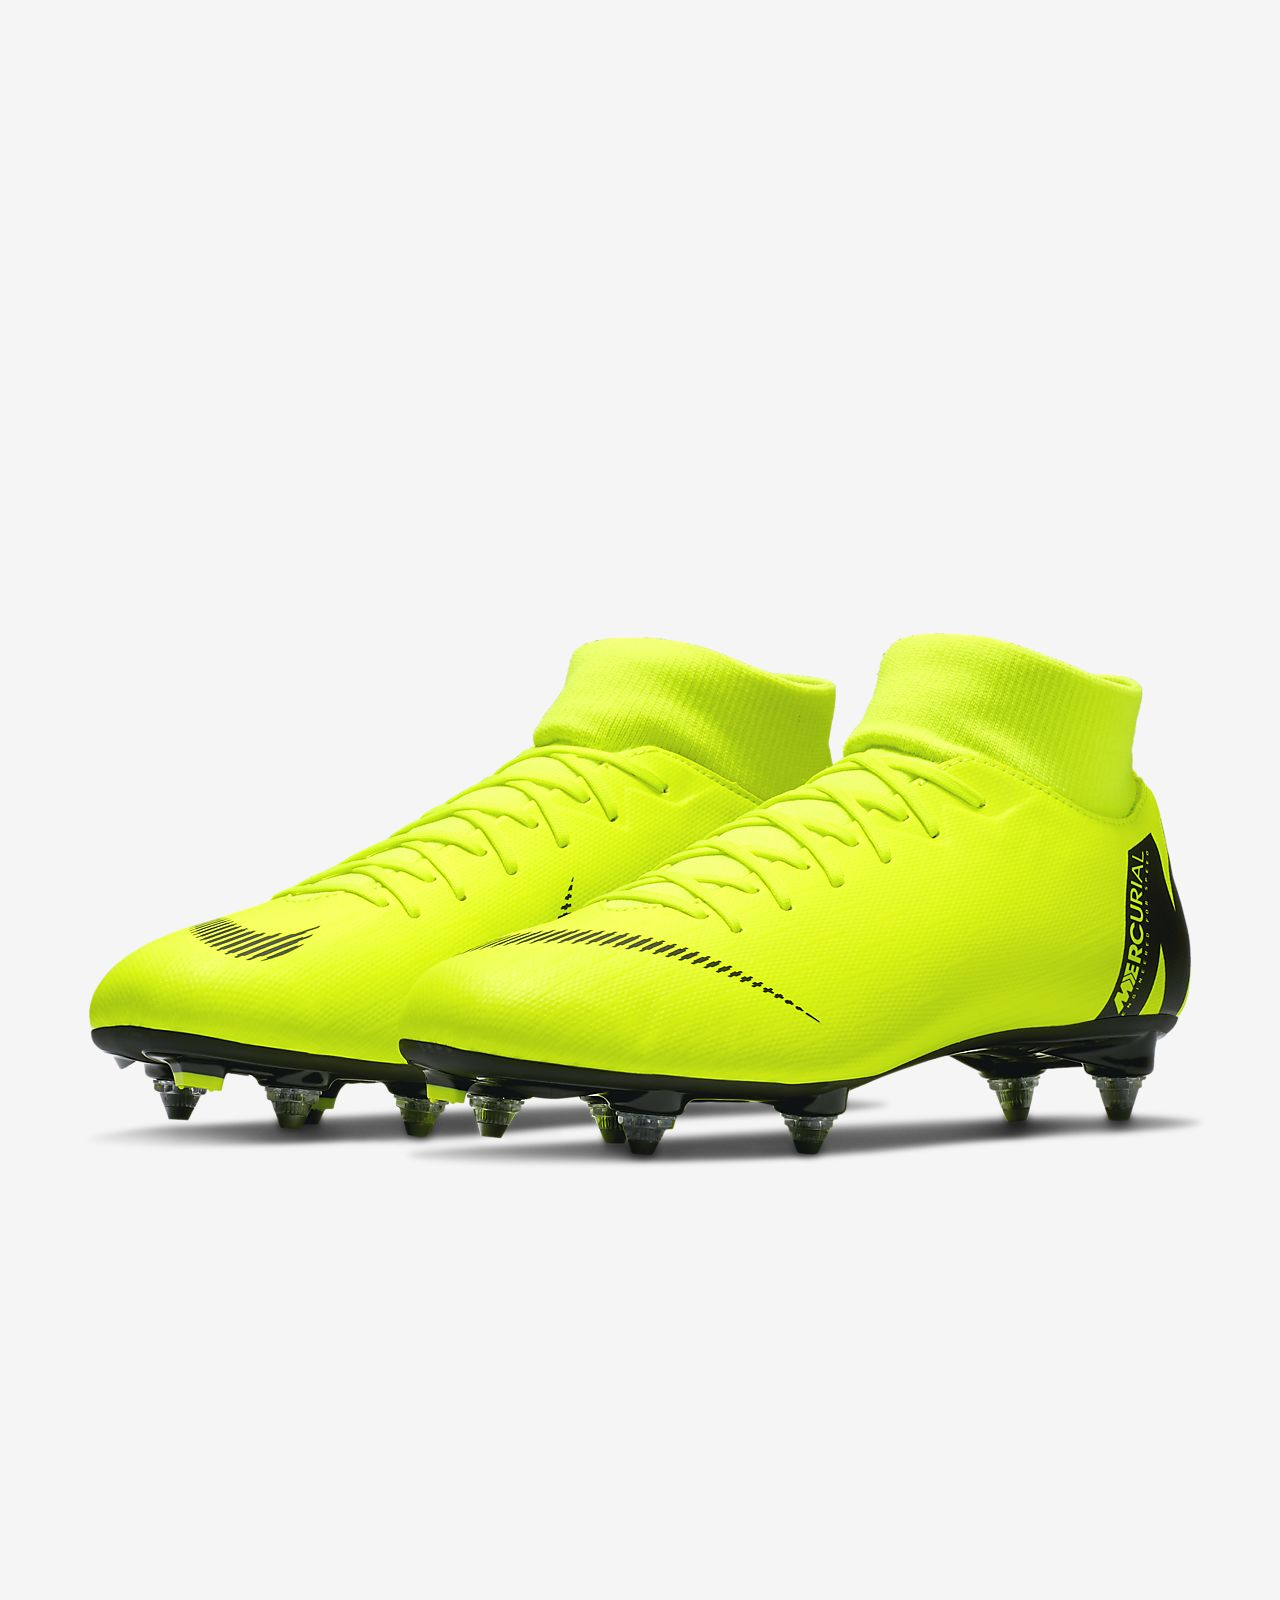 brand new 0d404 814c9 ... Chaussure de football à crampons pour terrain gras Nike Mercurial  Superfly VI Academy SG-PRO